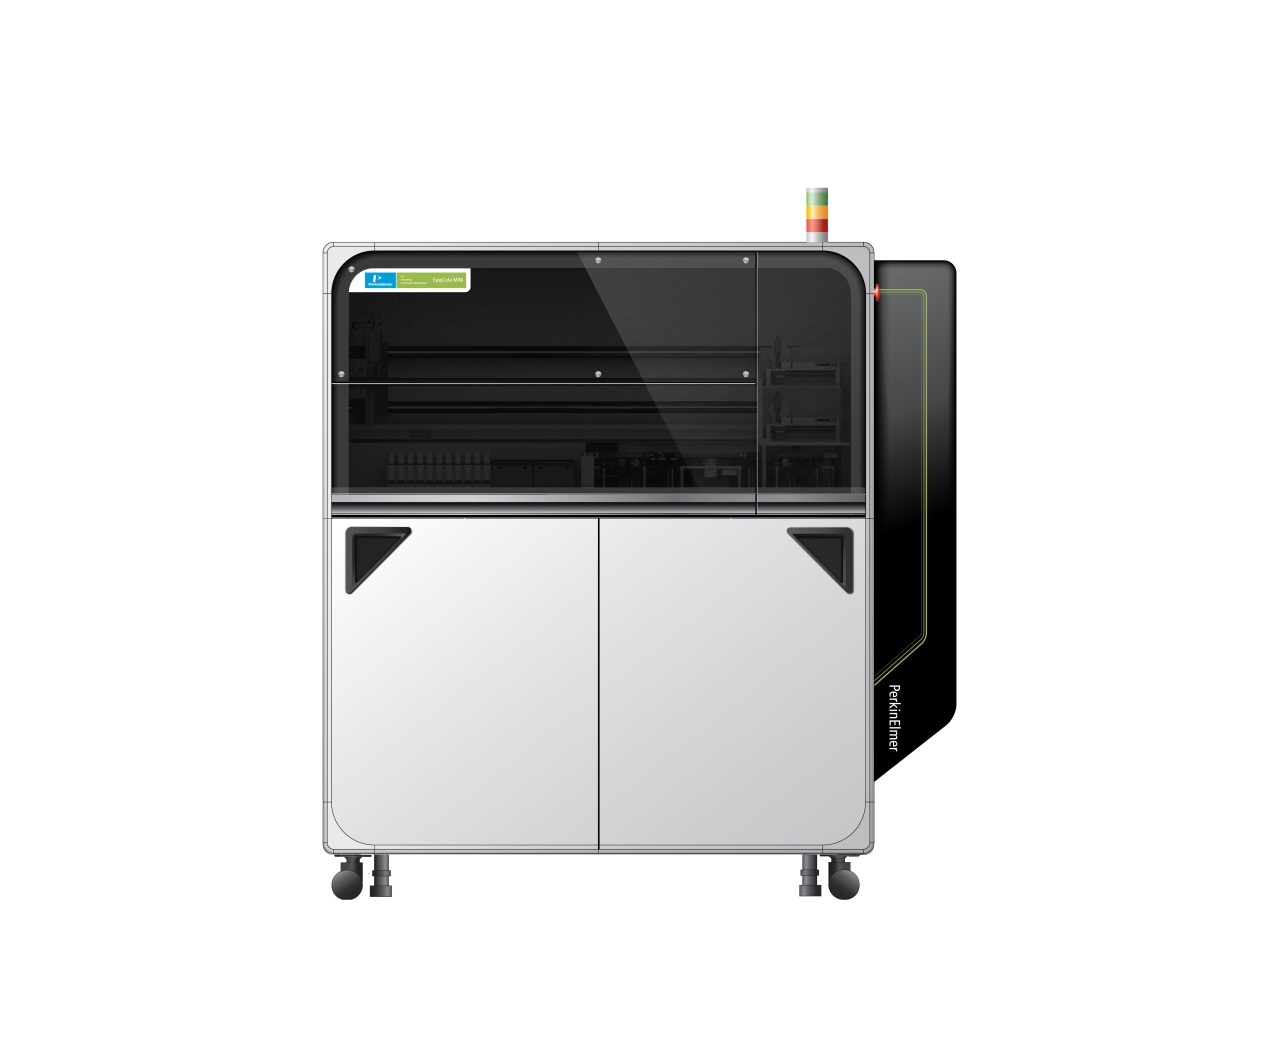 EasyCutta Mini Auto Immunoassay System 全自动免疫发光检测系统